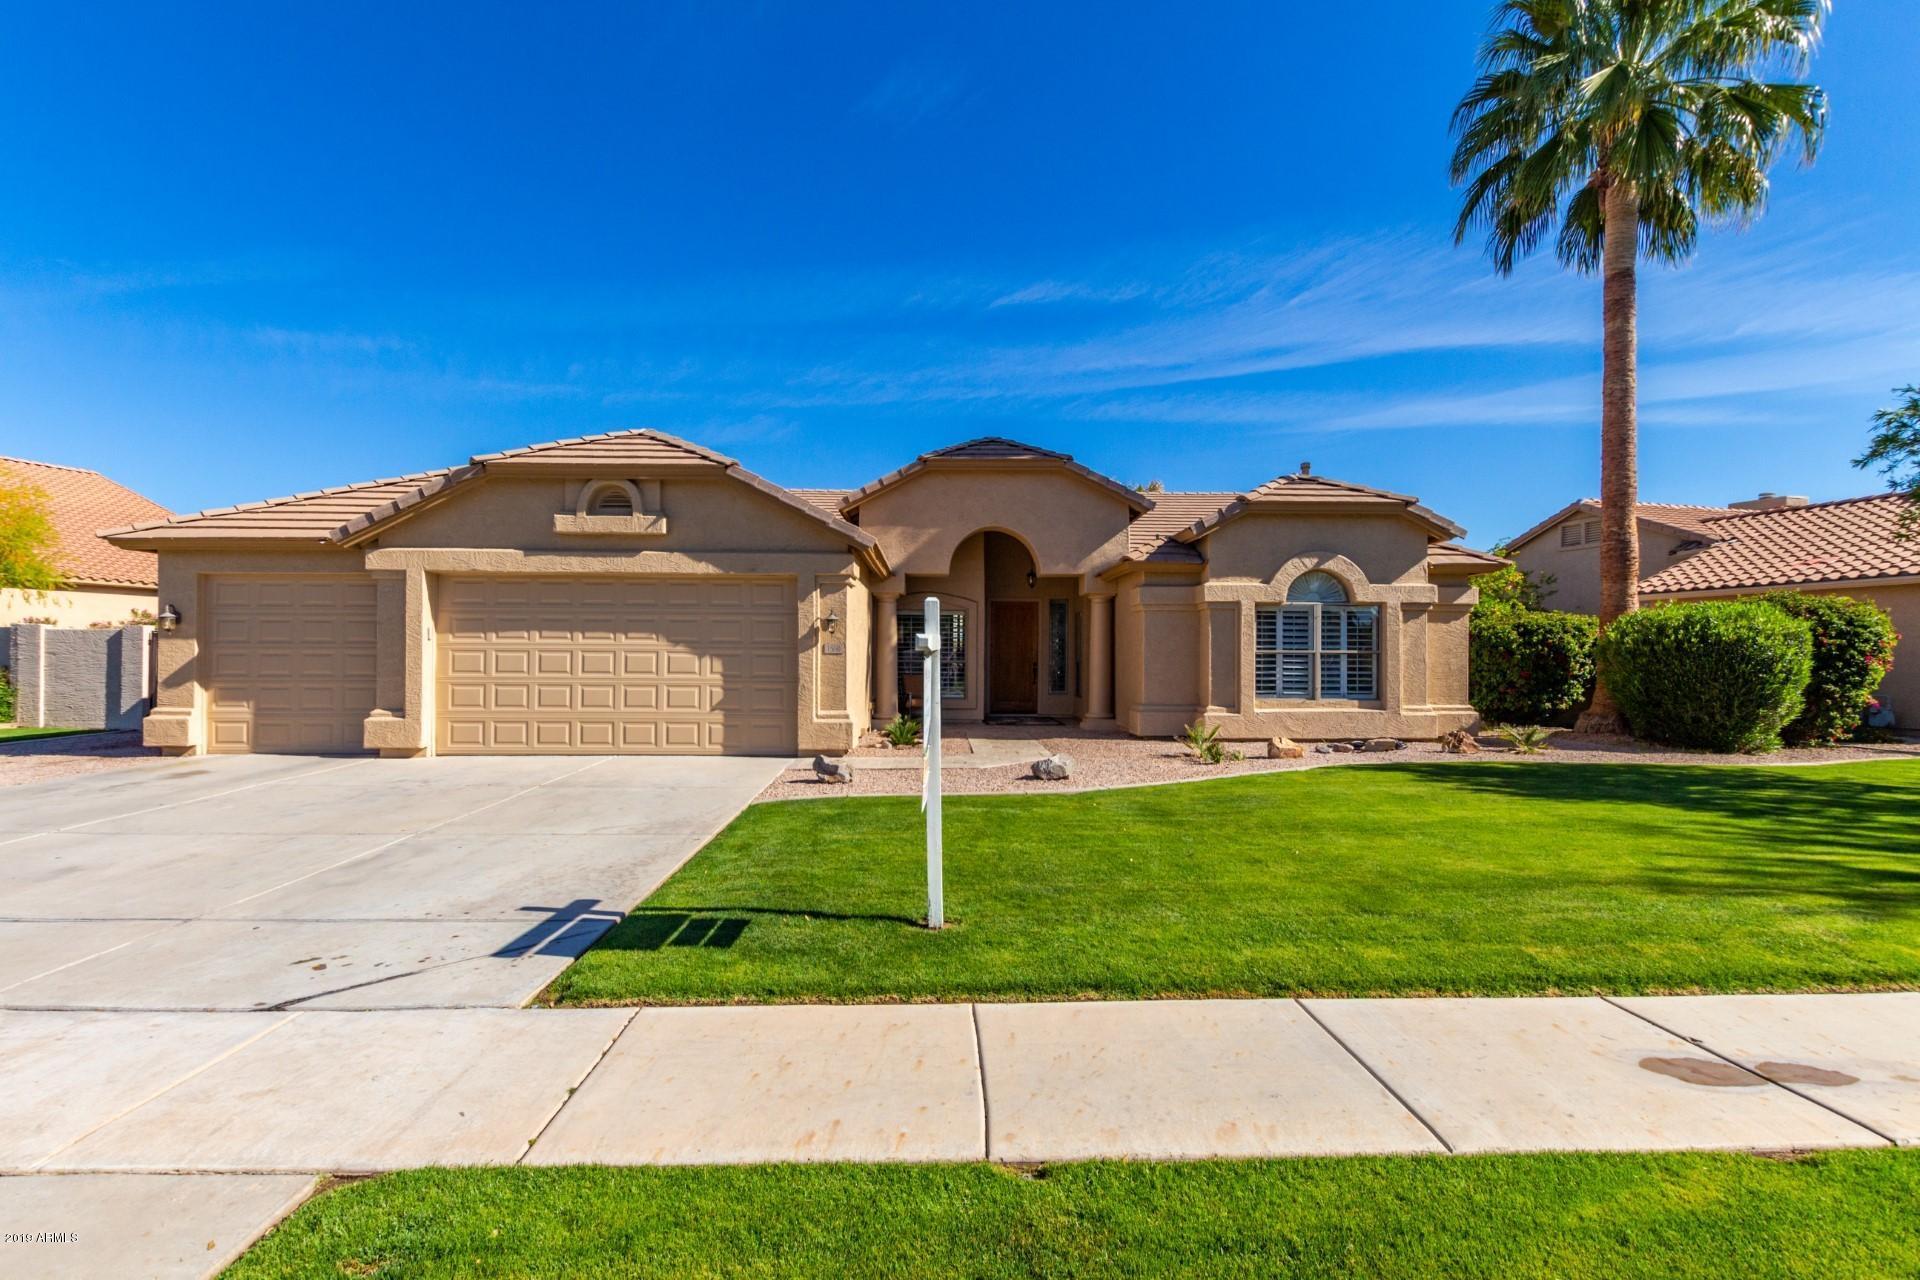 Photo of 1560 W BLUE RIDGE Way, Chandler, AZ 85248